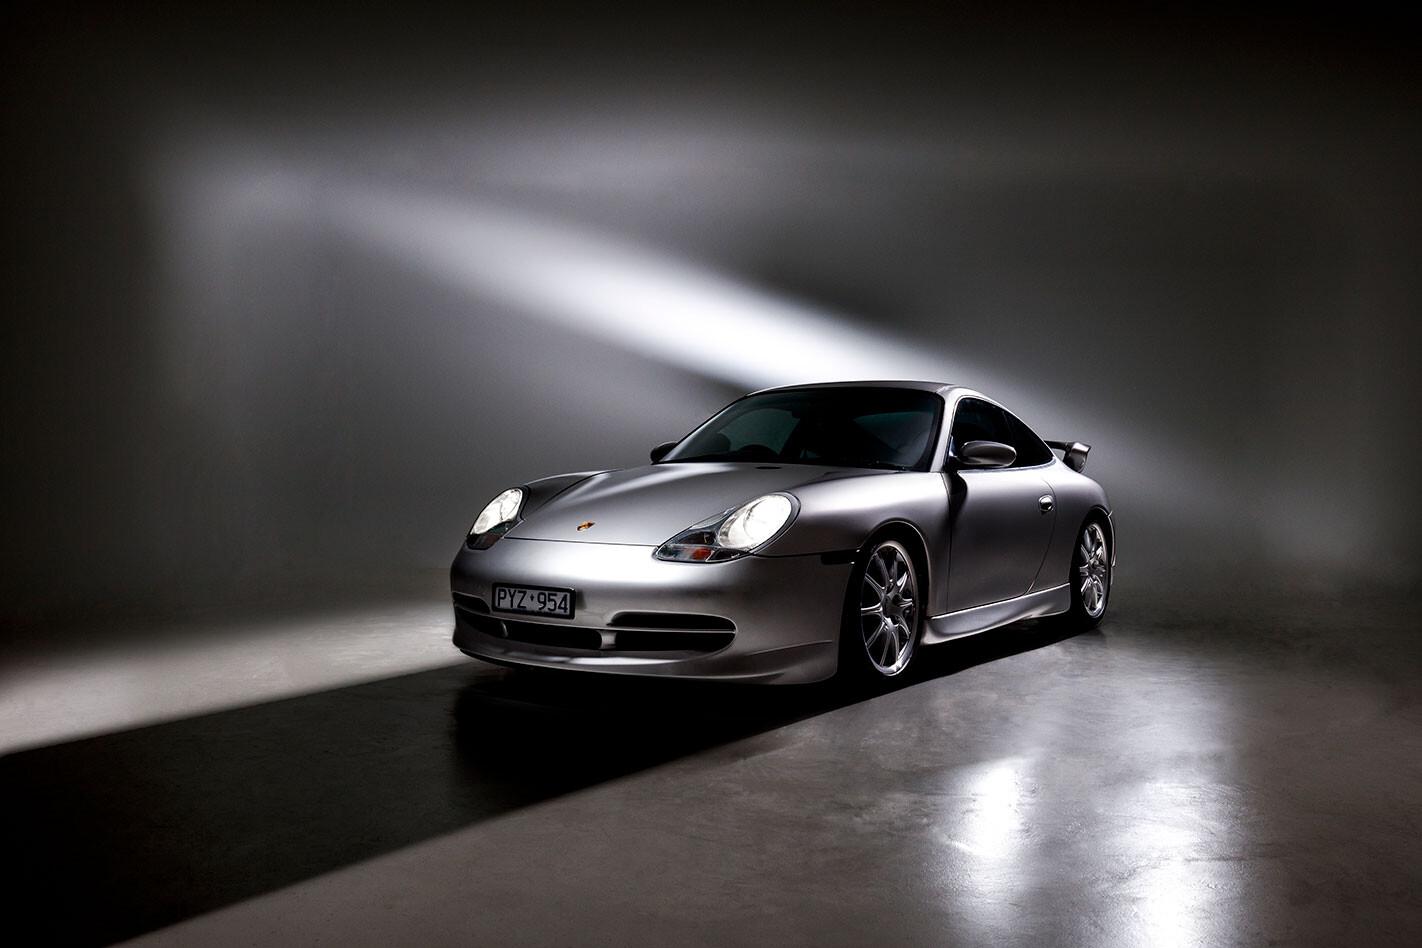 1999 Porsche 996.1 911 GT3 Front